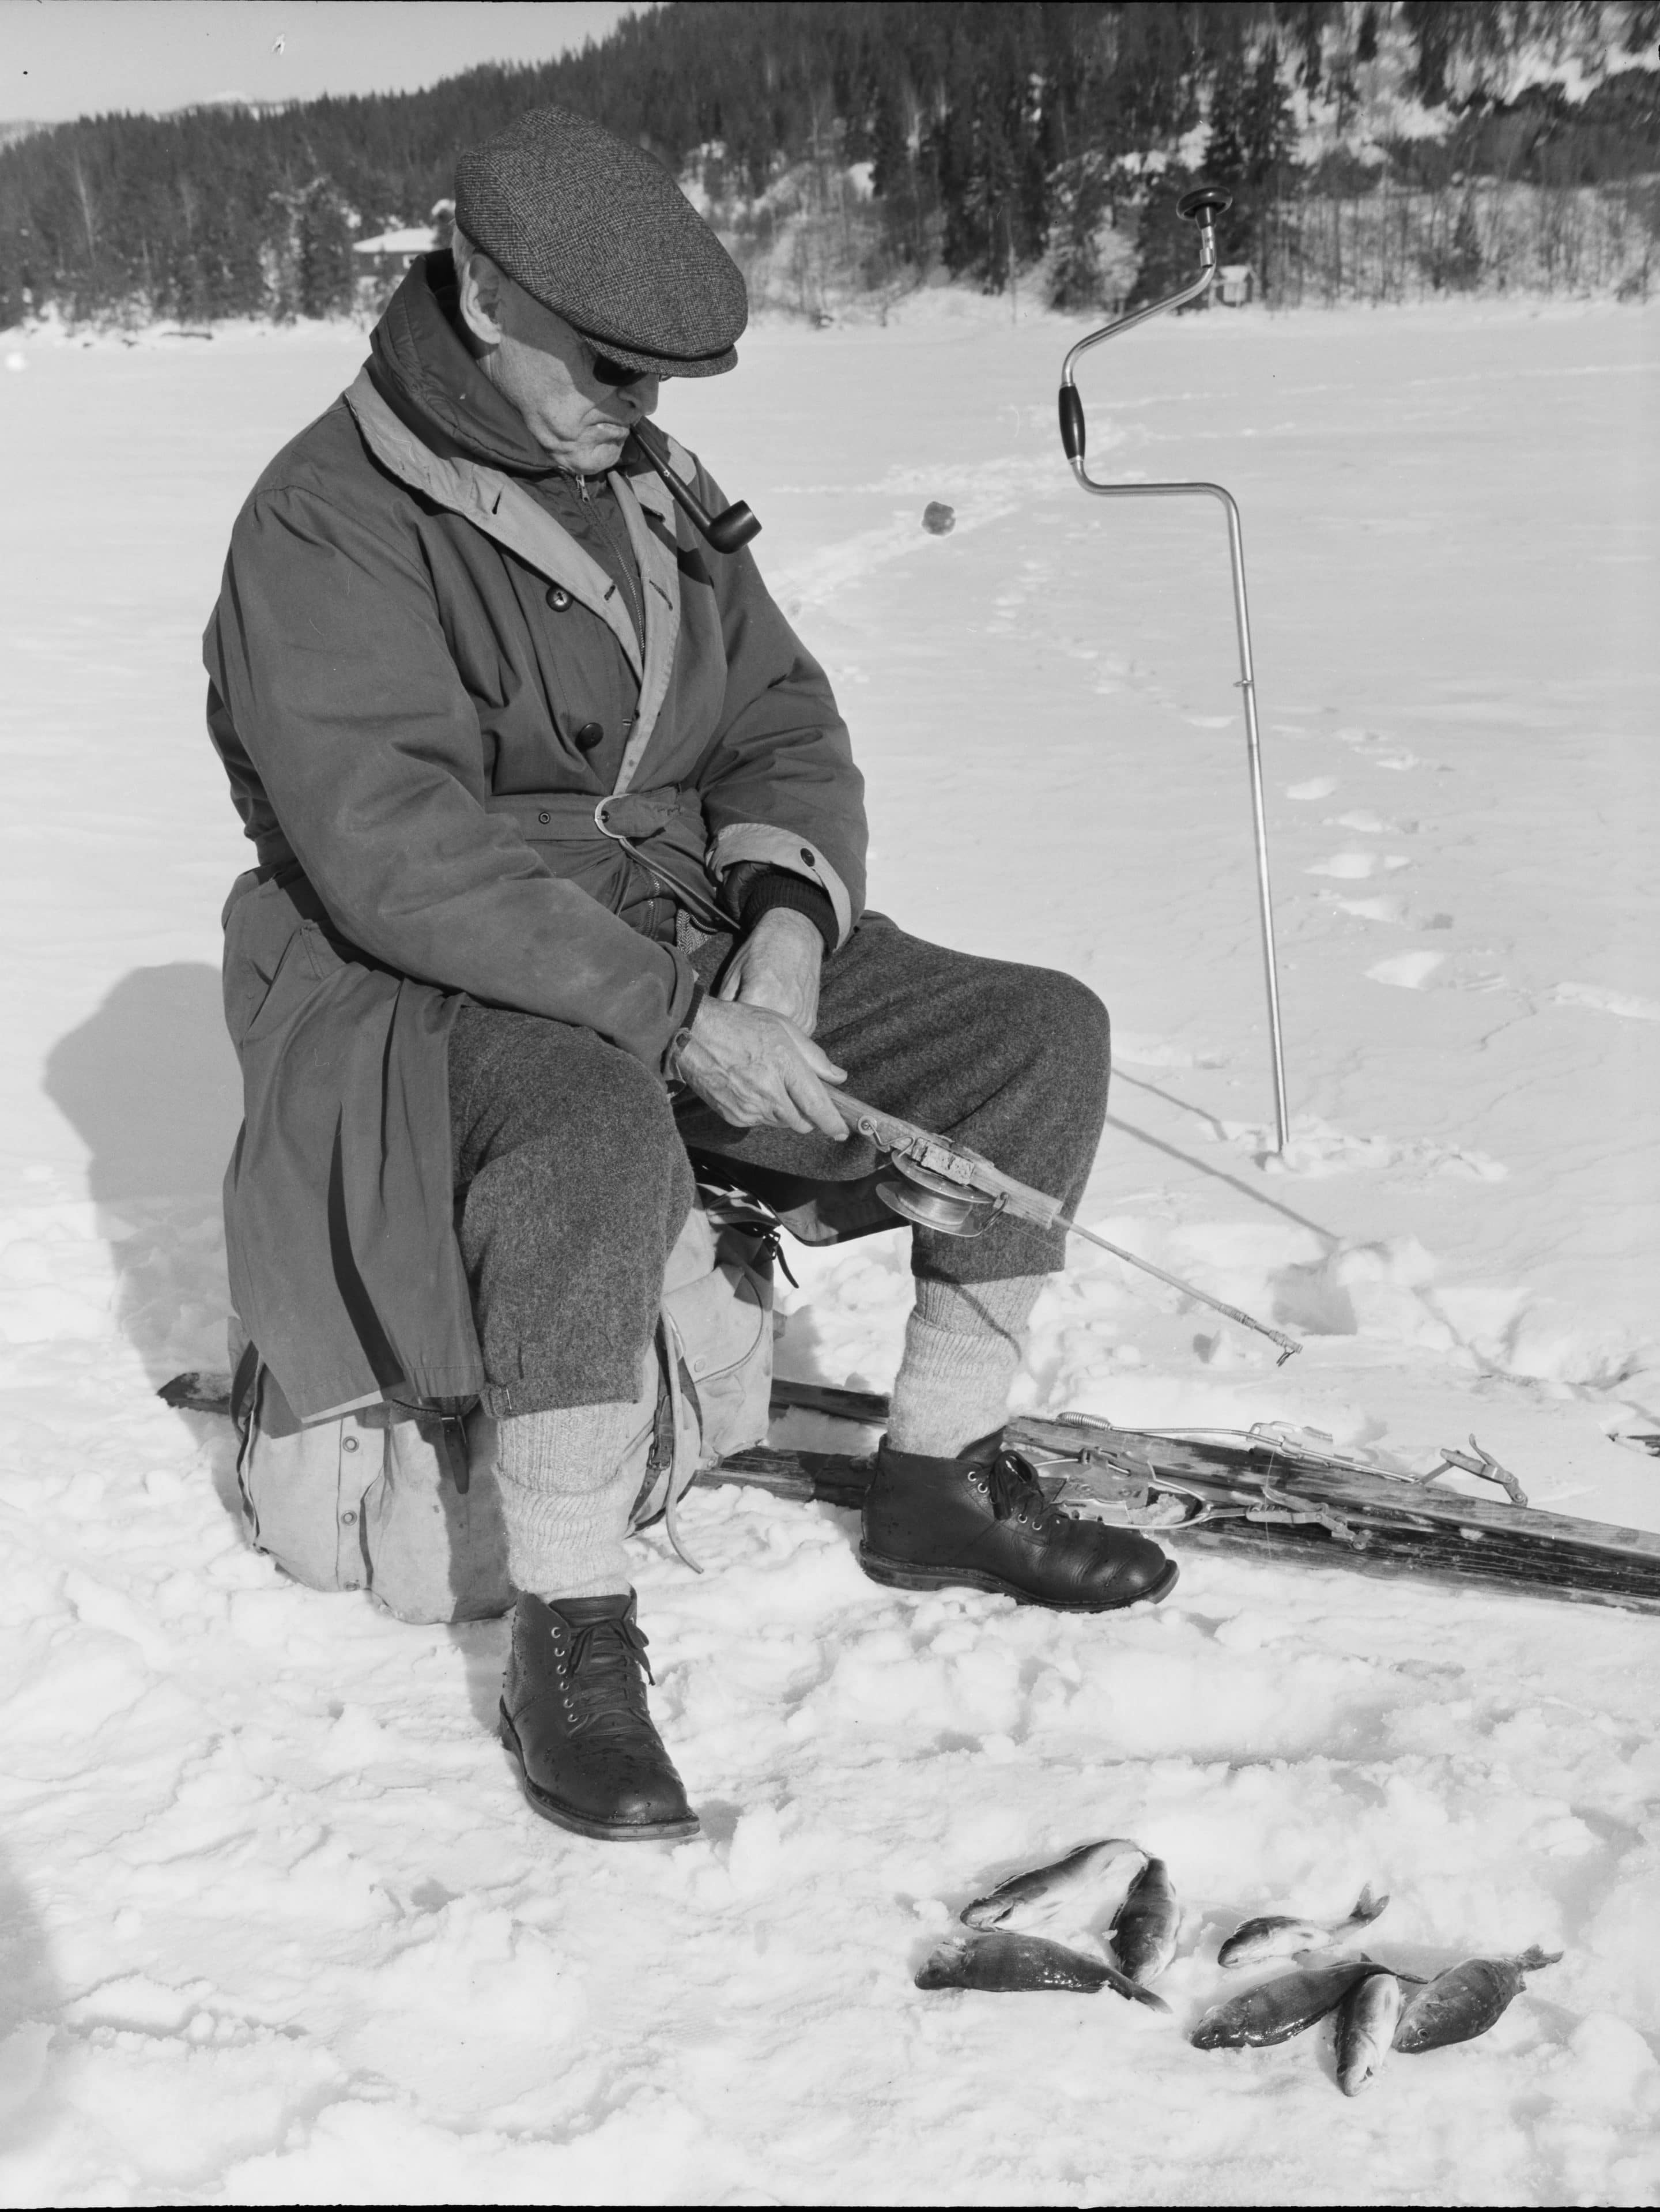 Ice-fishing on Lake Tyrifjorden in 1966. | Photo: Arnulf Husmo - Mittet & Co AS cc pdm.